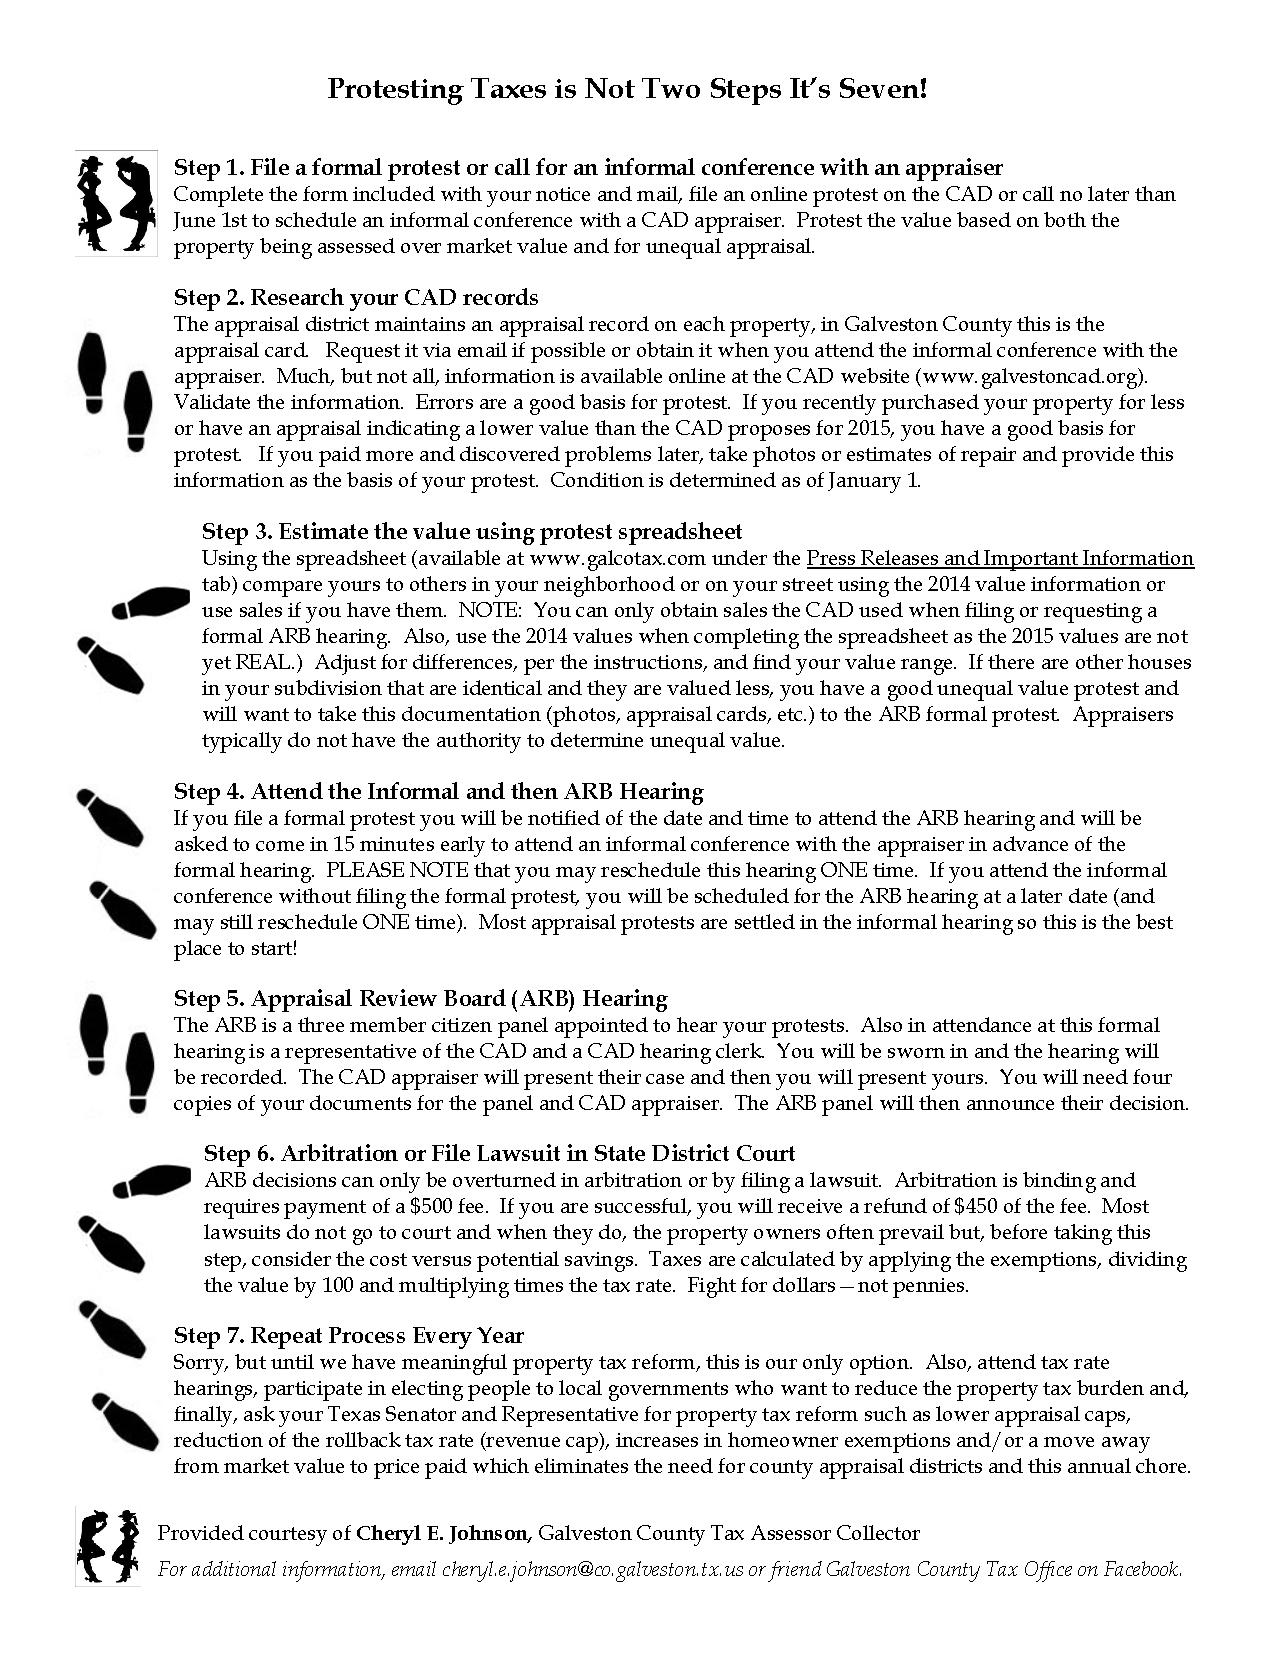 cheryl-johnson-texas-tax-seven-step-protest-process